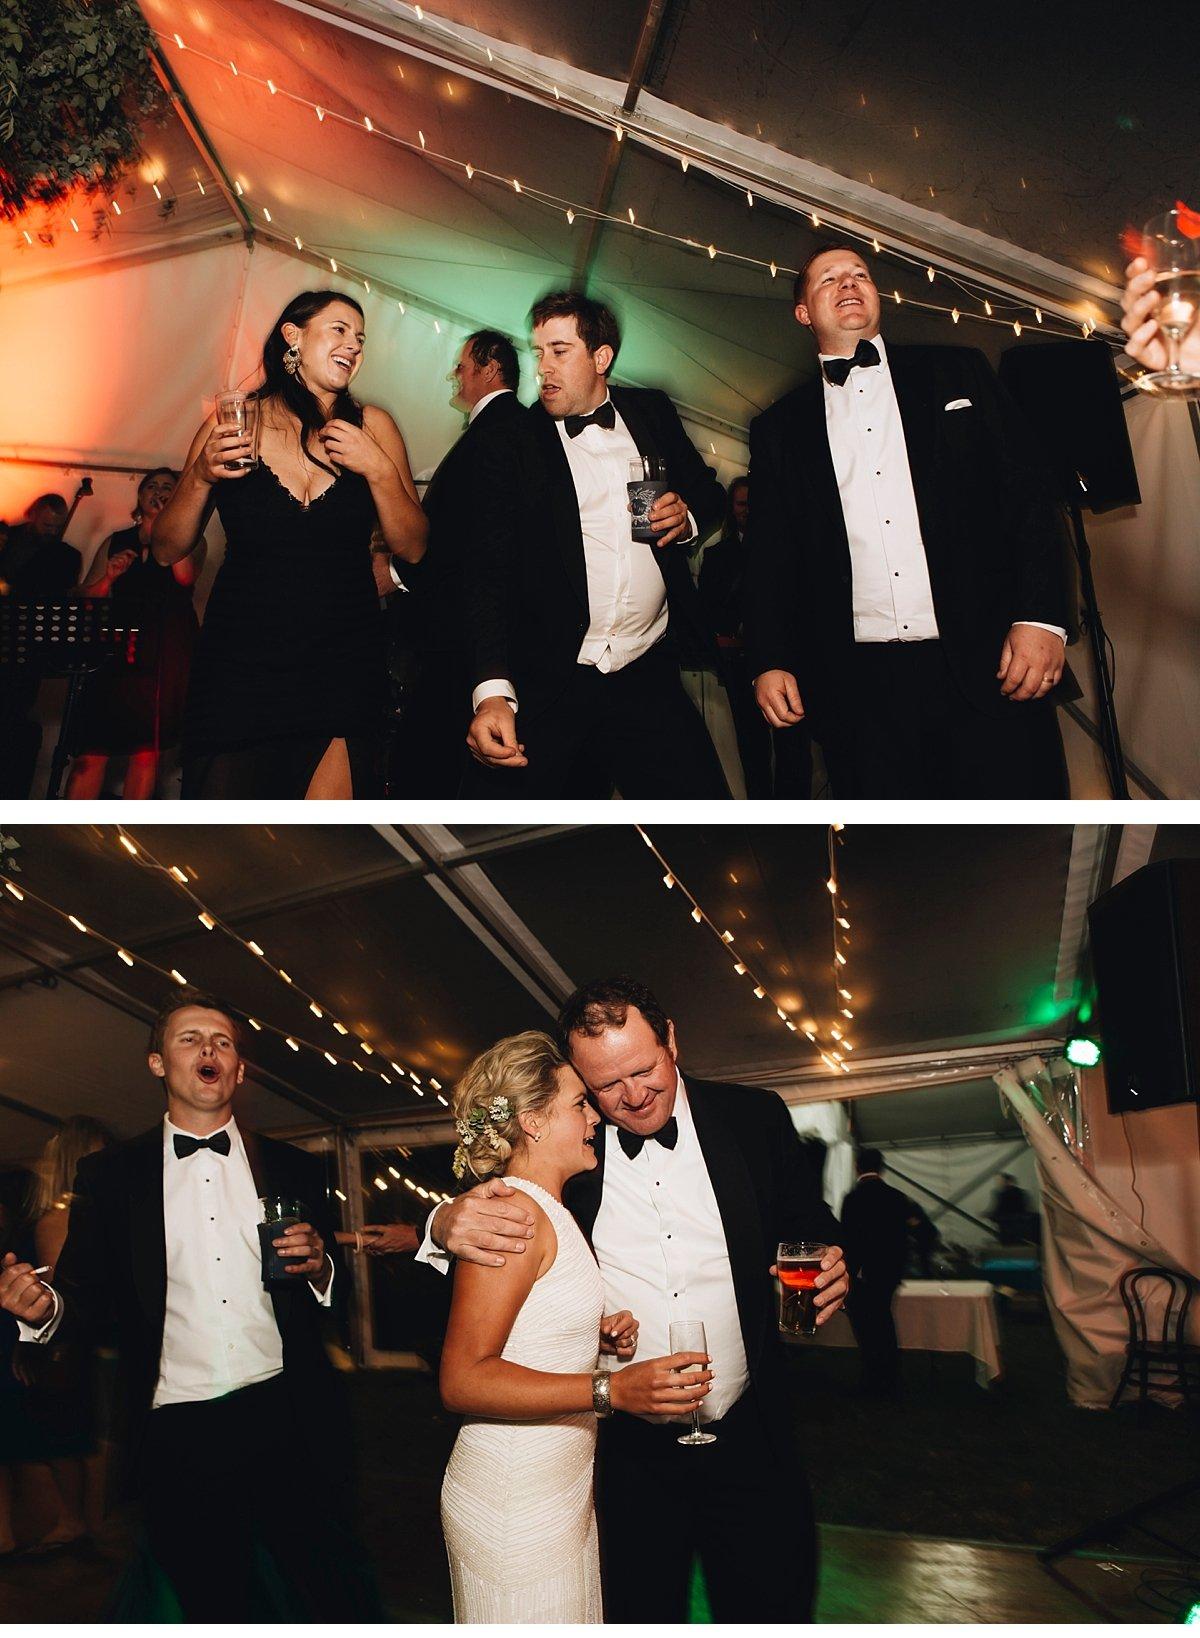 Gundagai Wedding Photographer NSW photographers Wagga Wagga Albury Rutherglen20